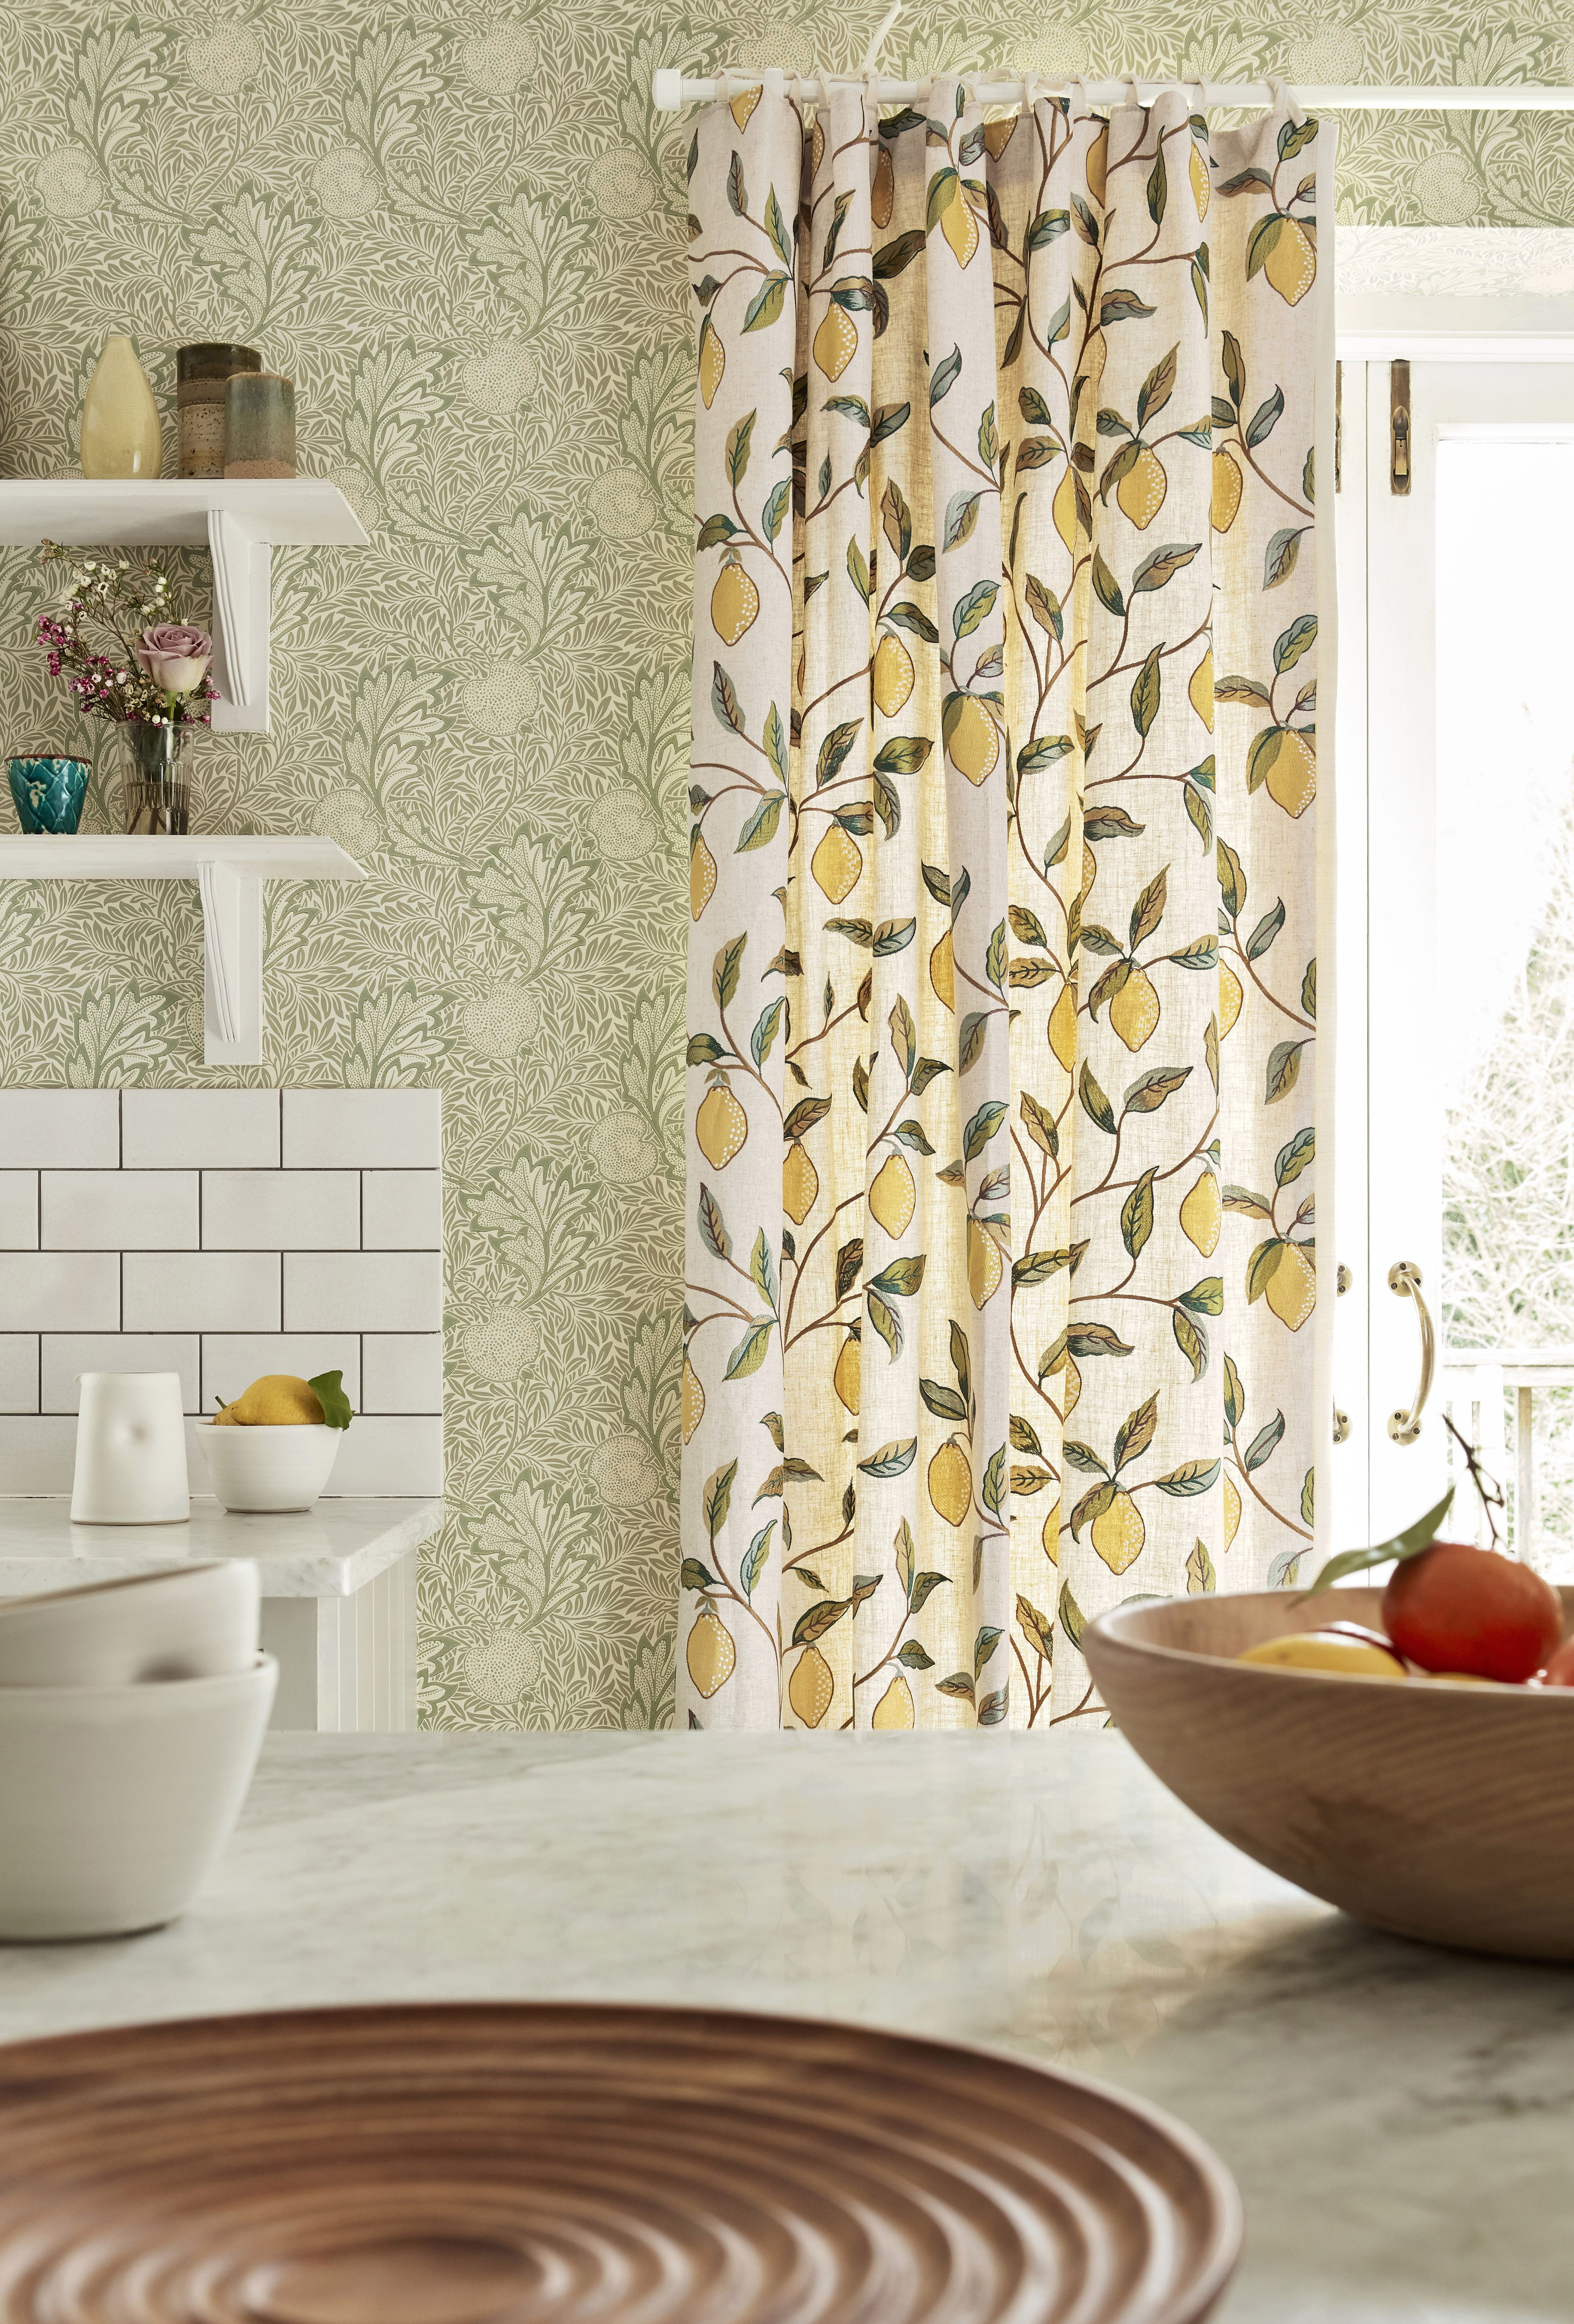 Morris & Co Apple Bay Leaf in 2020 Apple wallpaper